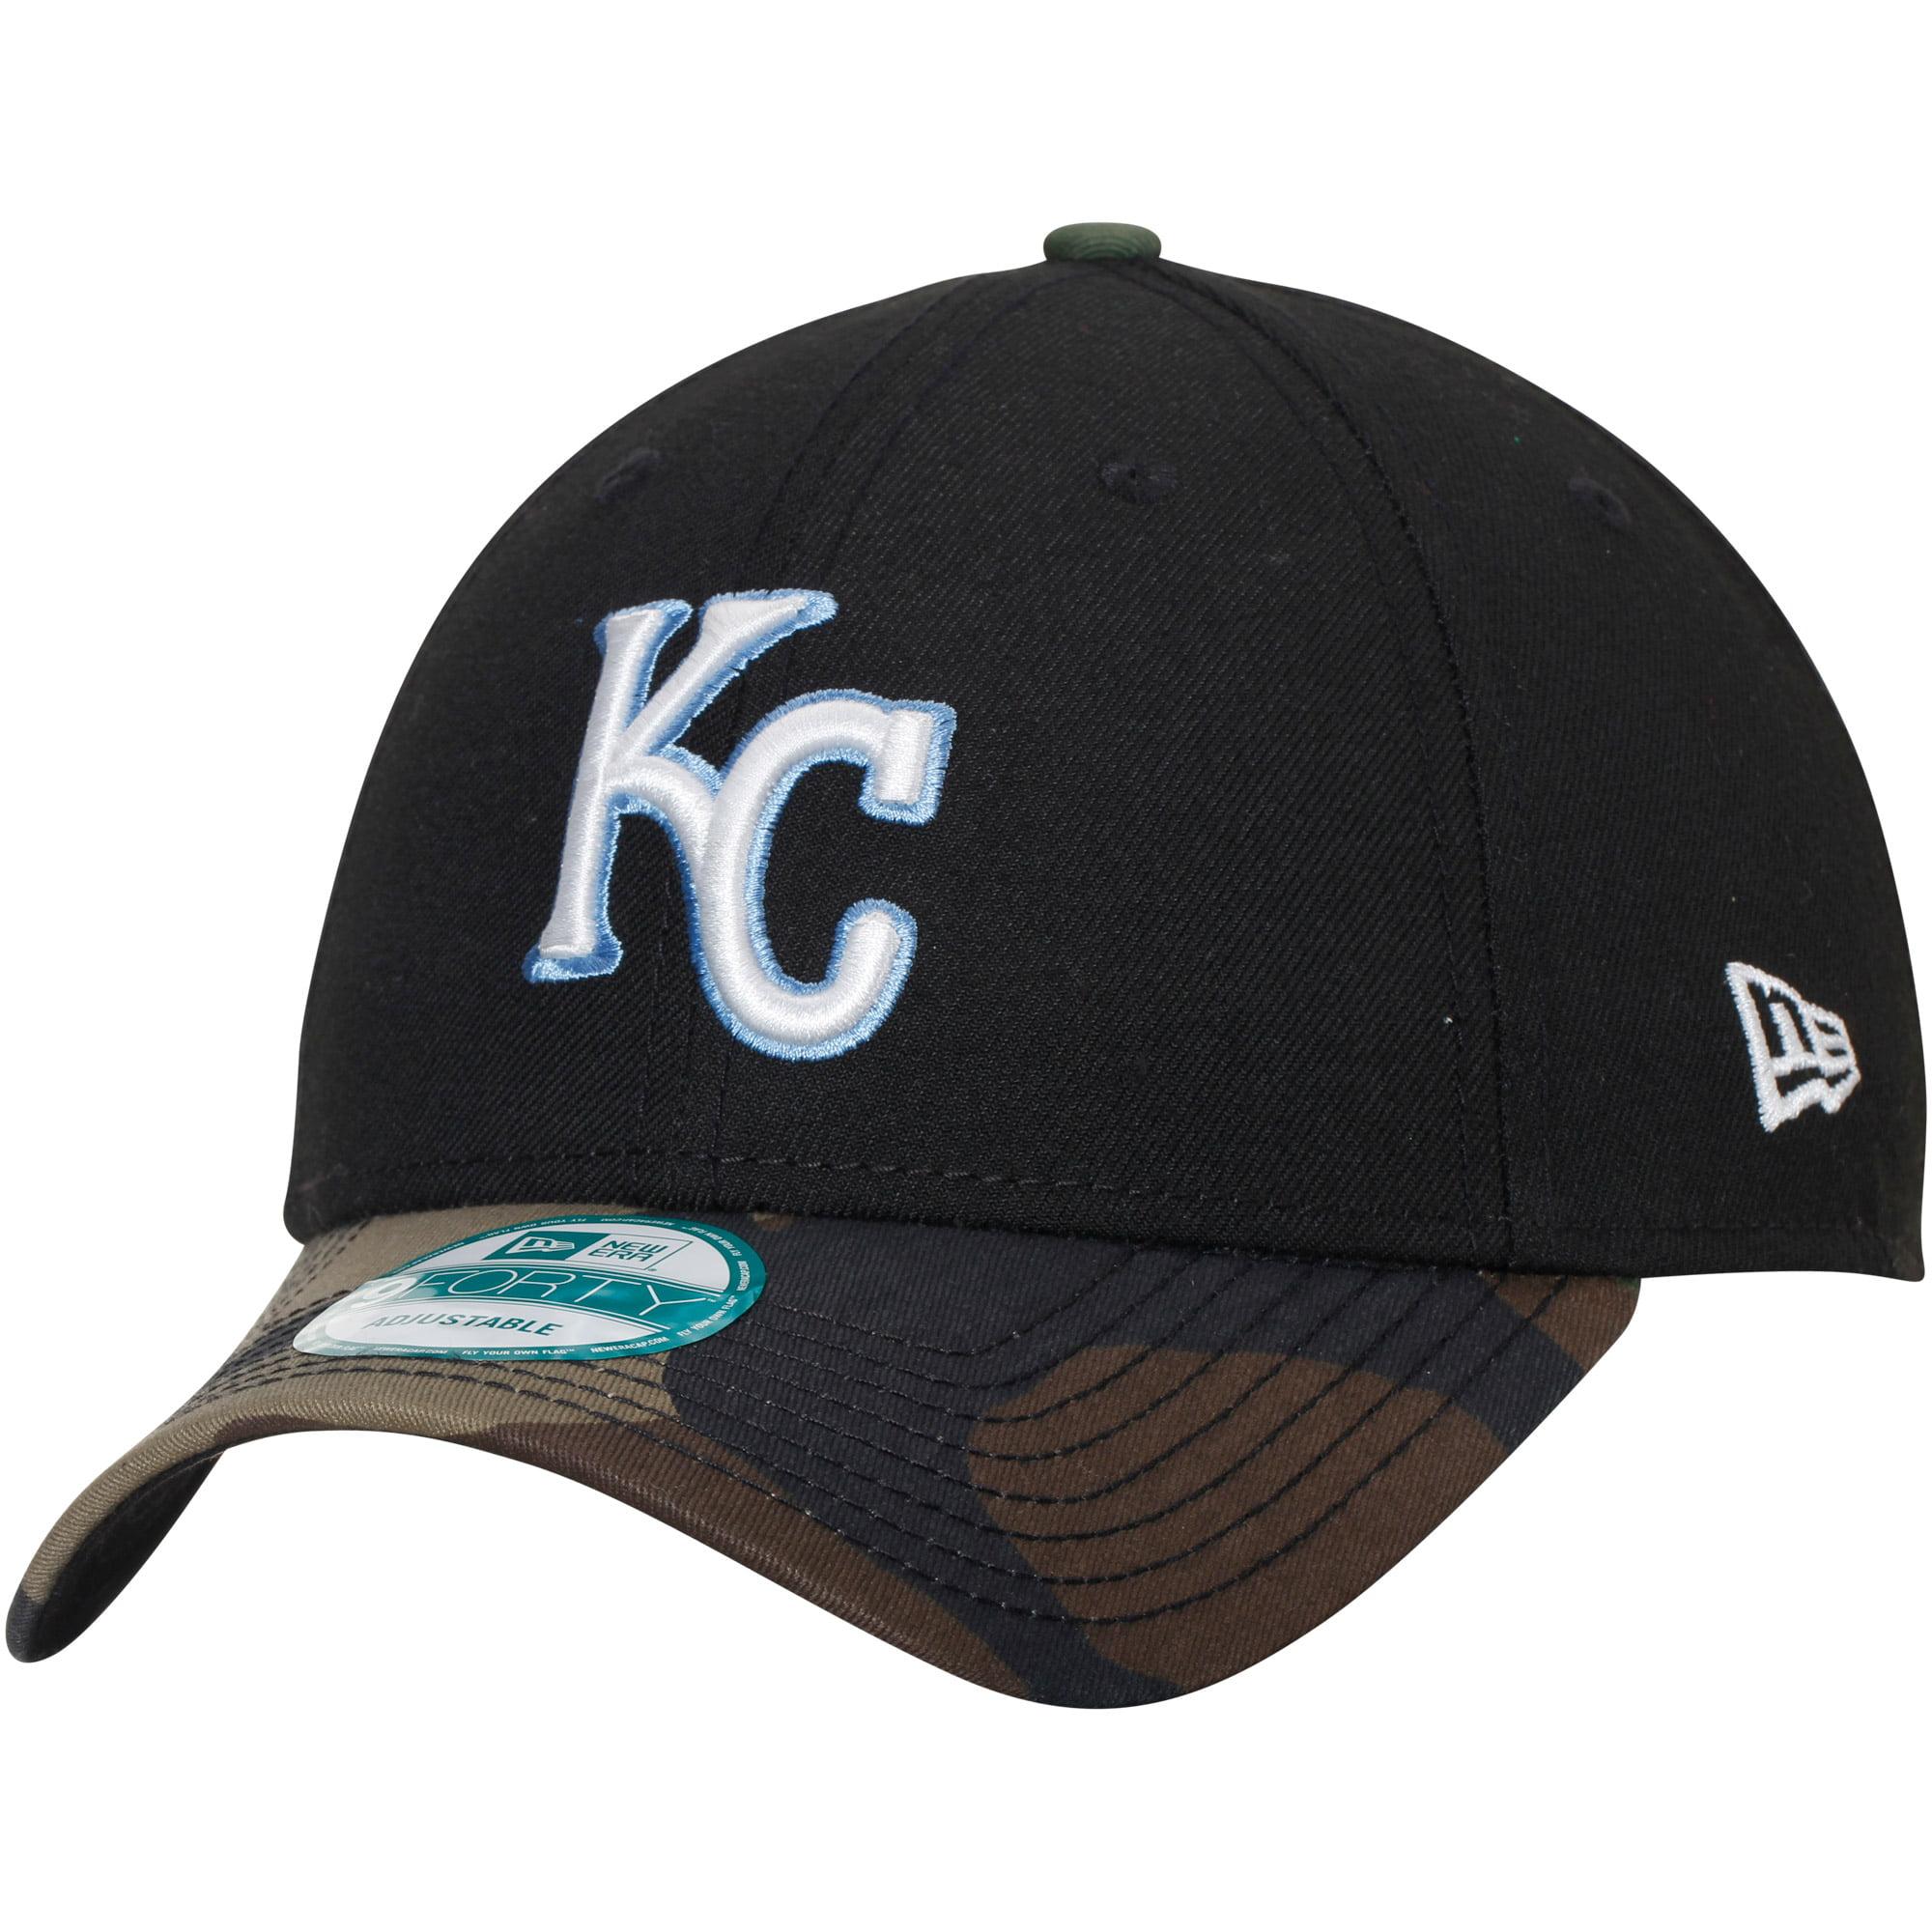 Kansas City Royals New Era The League 9FORTY Adjustable Hat - Black/Camo - OSFA